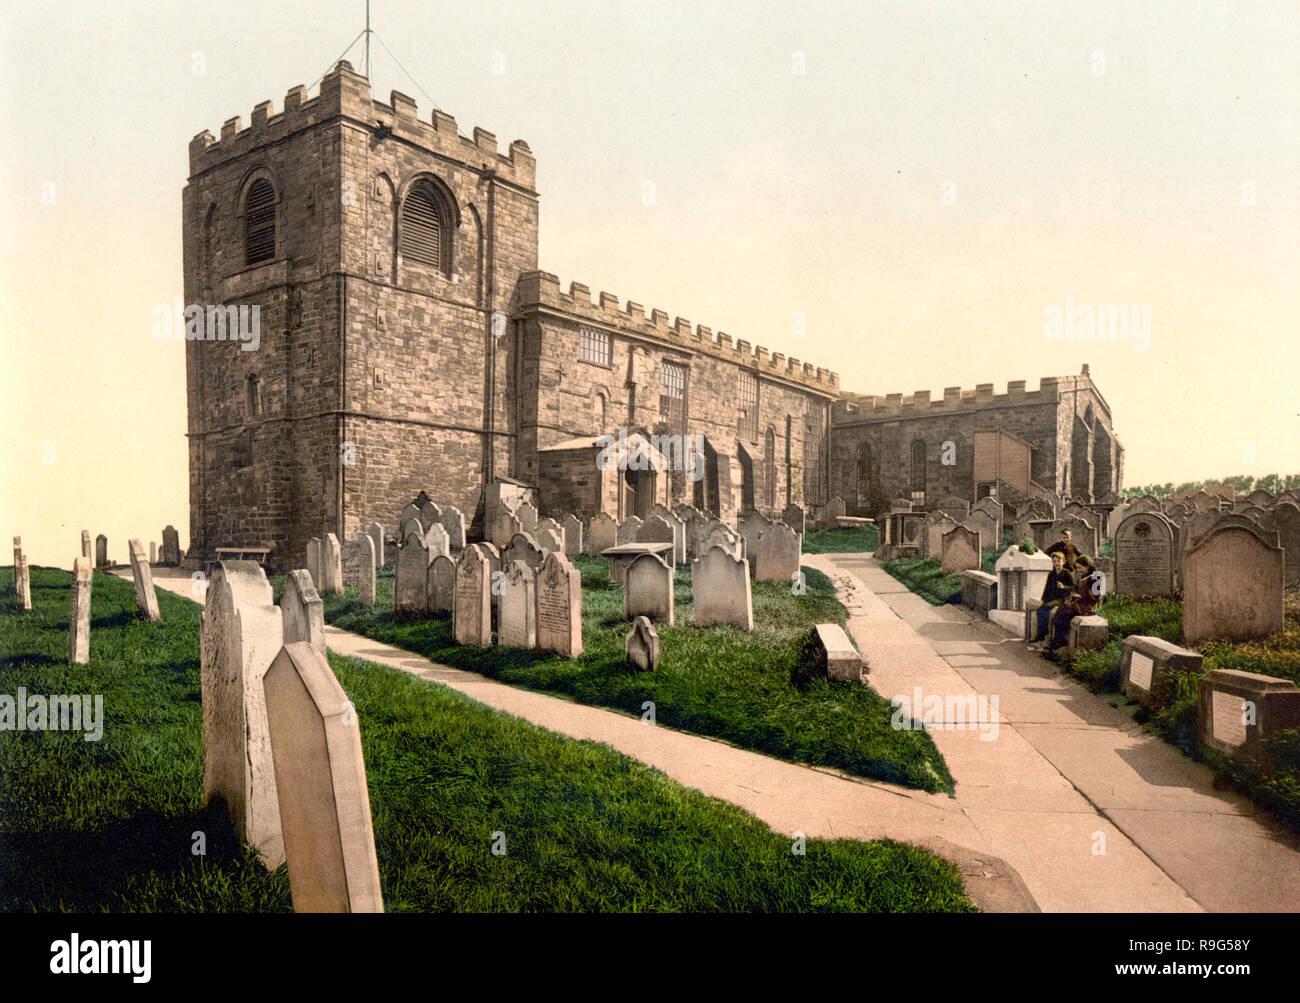 Whitby, St. Mary's Church, Yorkshire, England, circa 1900 - Stock Image